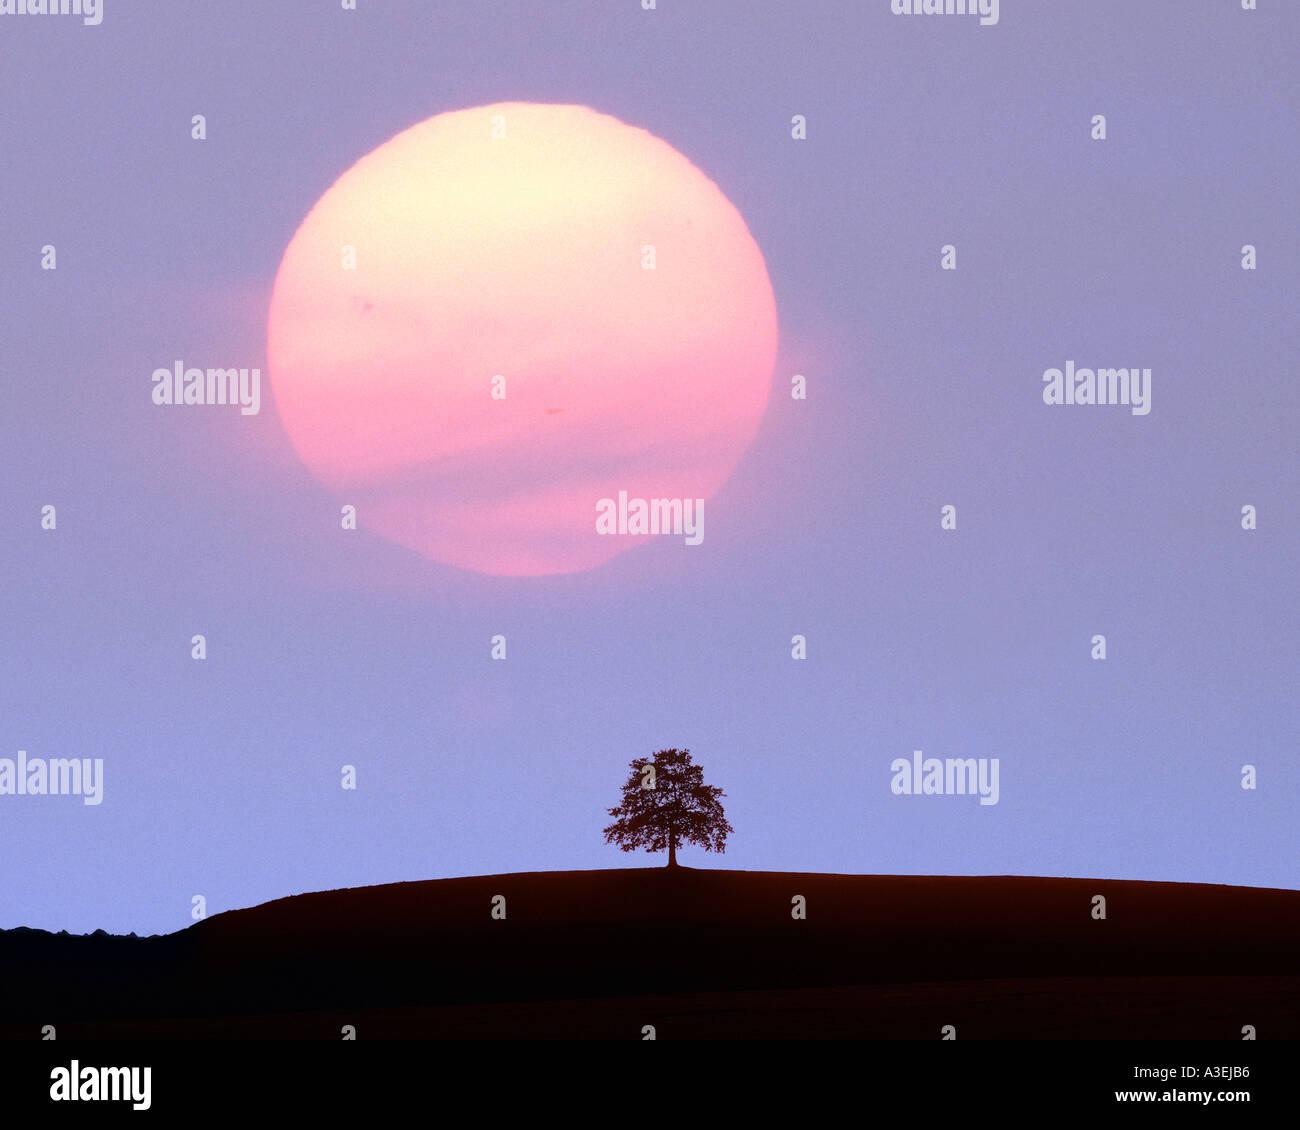 DE - Bayern: Sonnenuntergang über Baum Stockbild